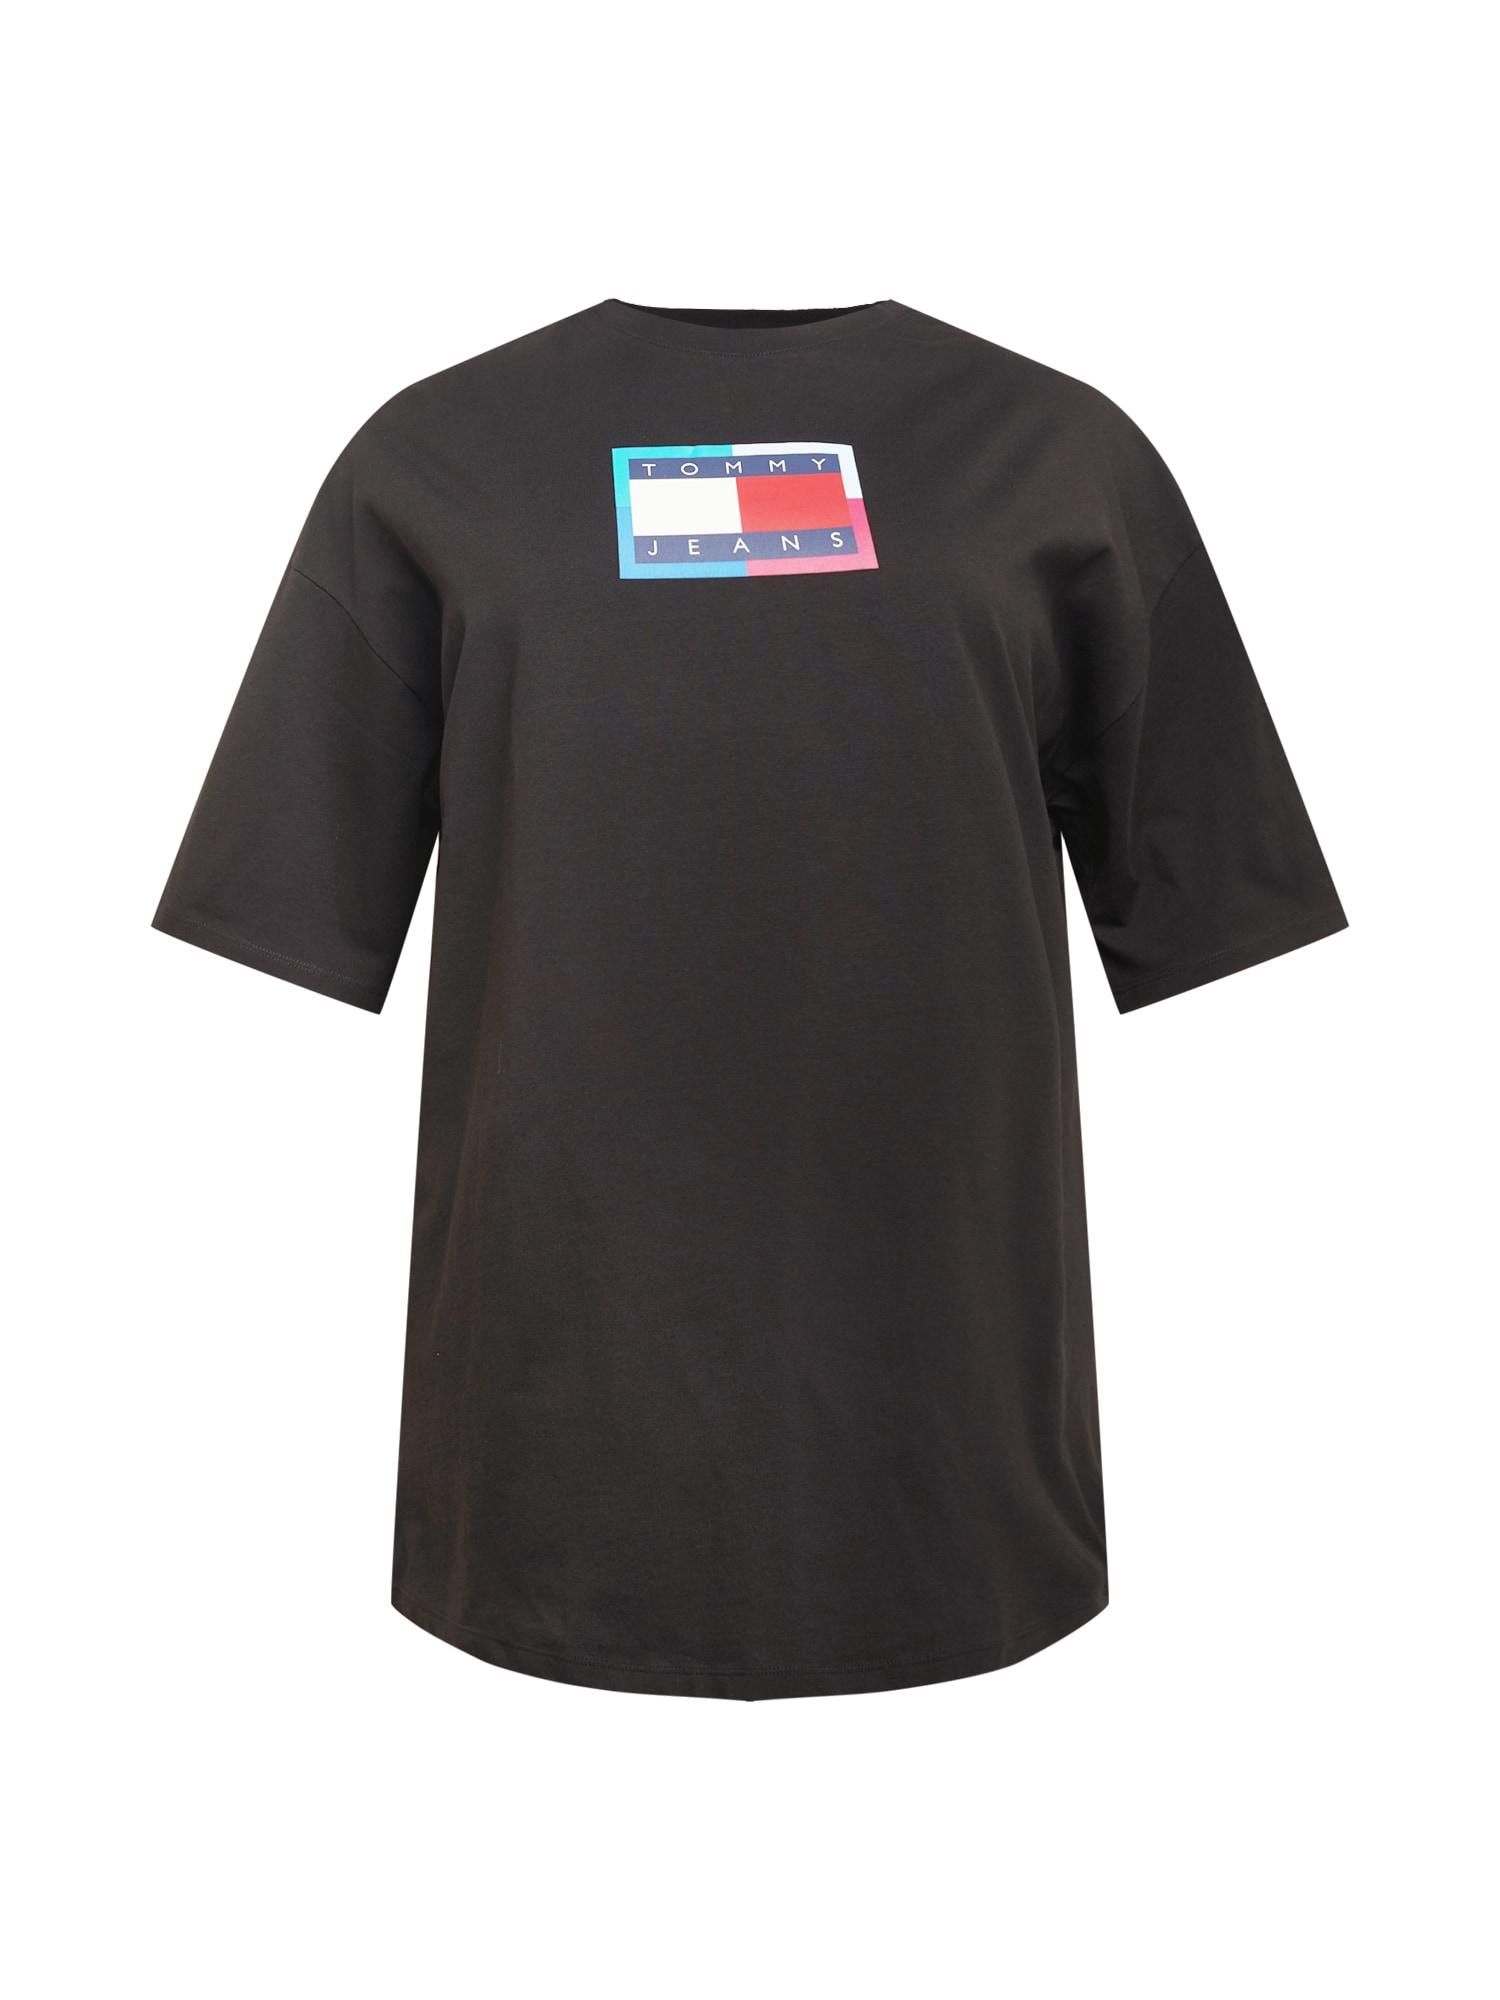 Tommy Jeans Curve Suknelė juoda / tamsiai mėlyna / raudona / balta